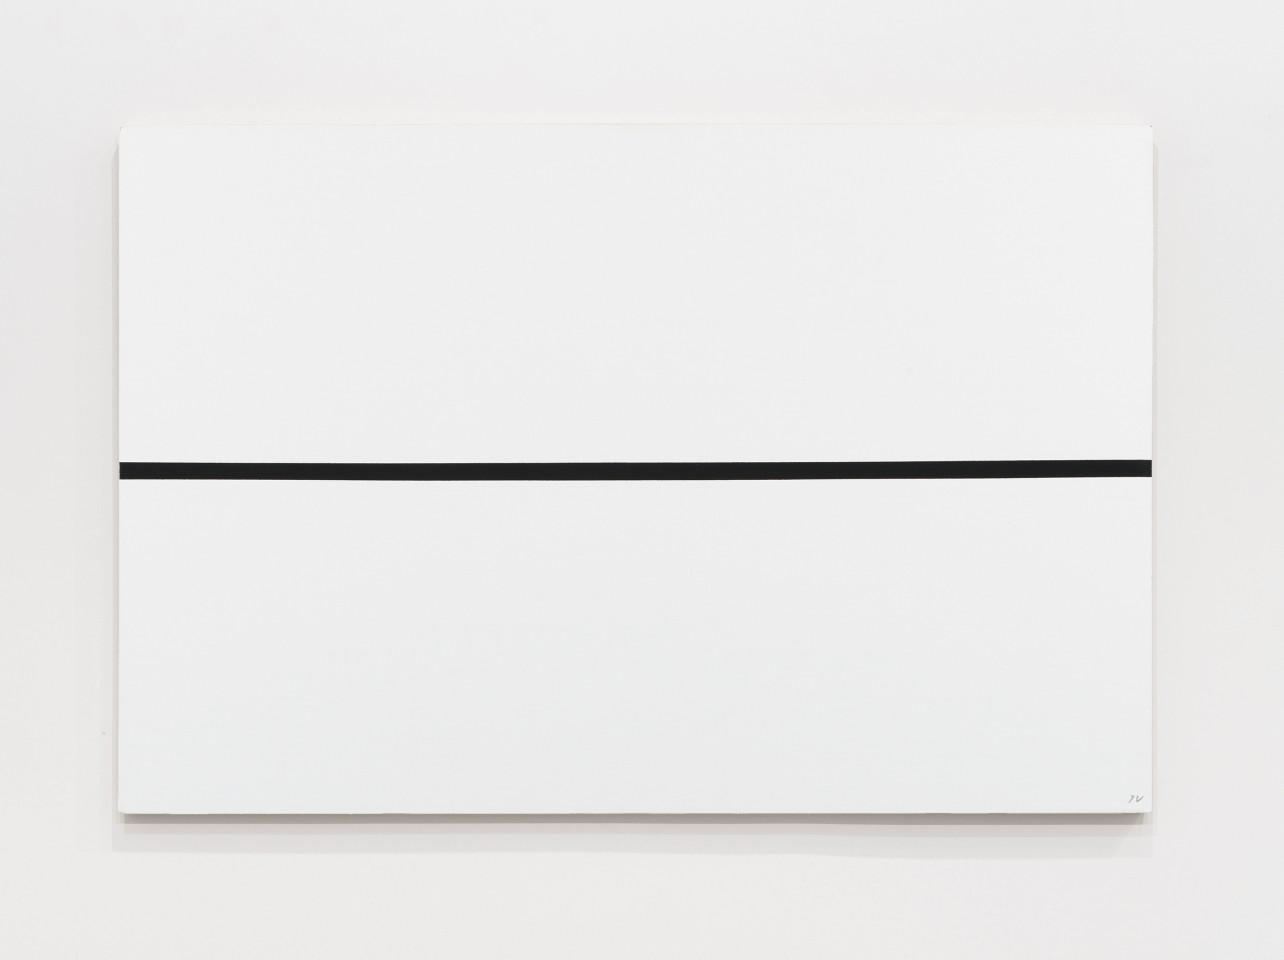 JOSIP VANIŠTA, Black line on a white surface, 1964‒1997